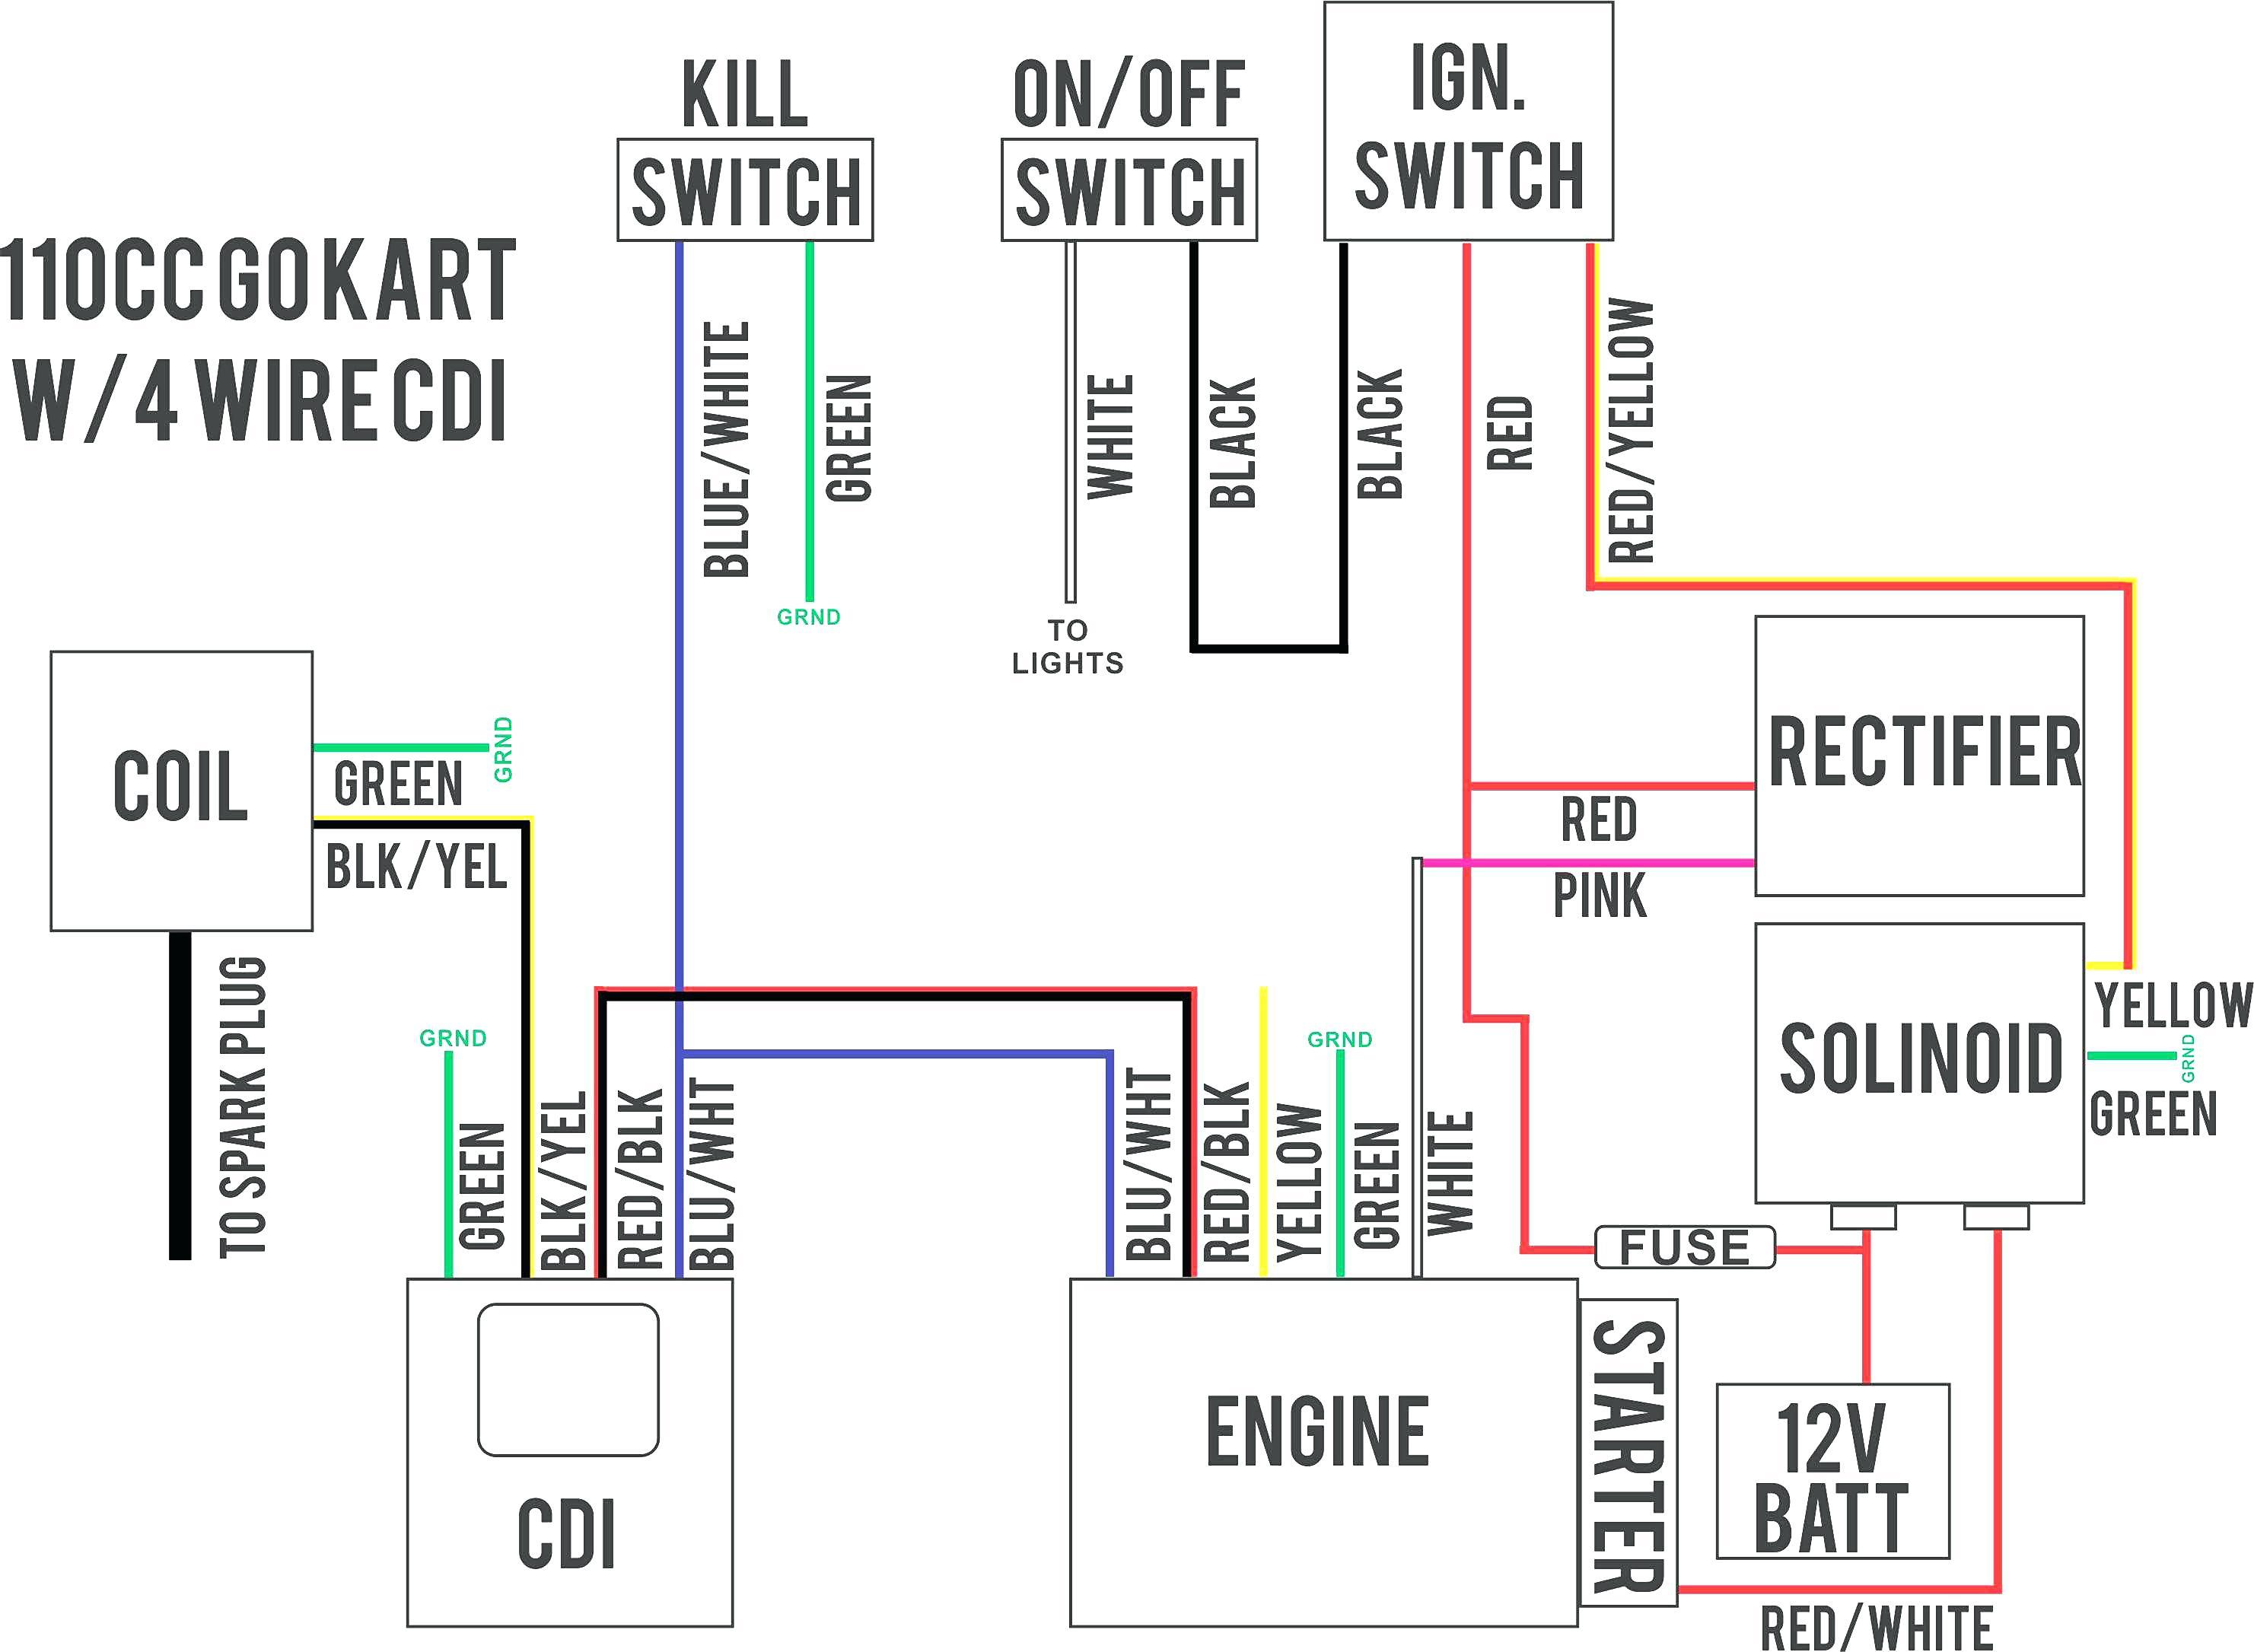 150Cc Scooter Wiring Diagram - Wiring Diagrams Hubs - 150Cc Scooter Wiring Diagram